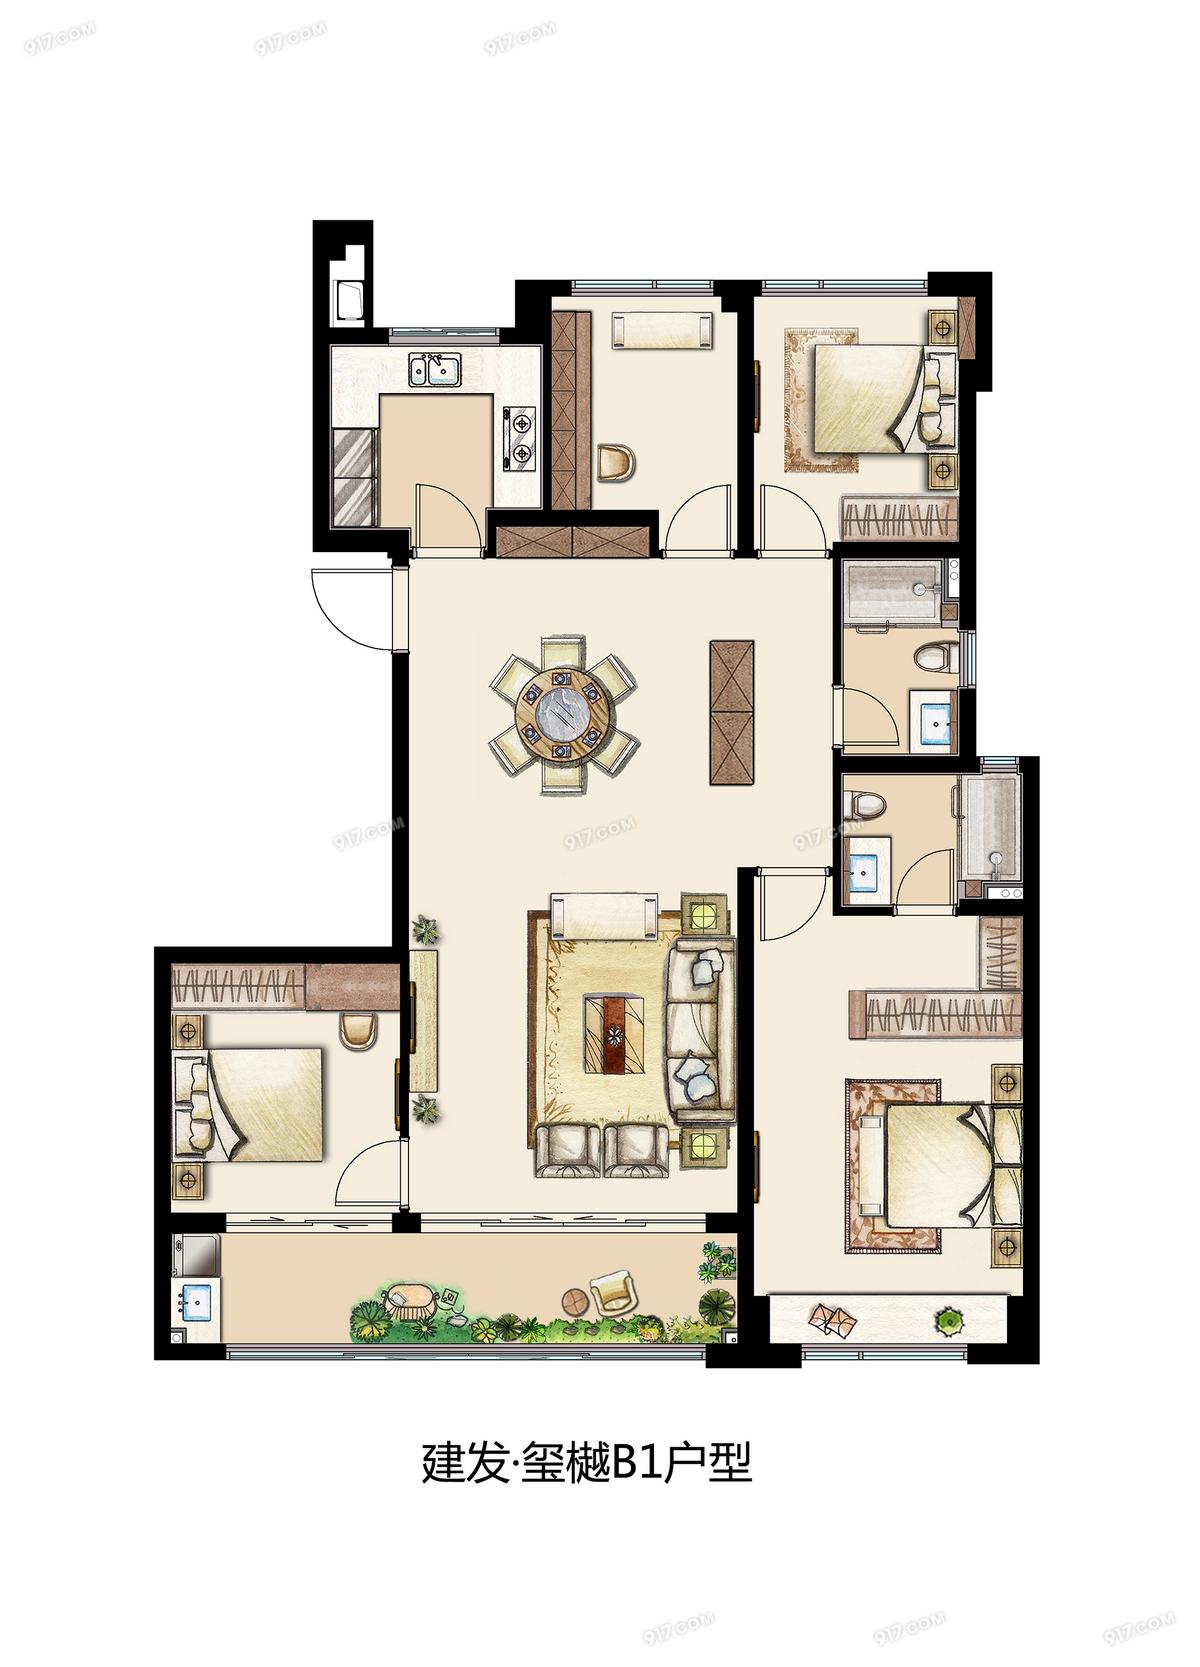 B1 143平 四室两厅两卫